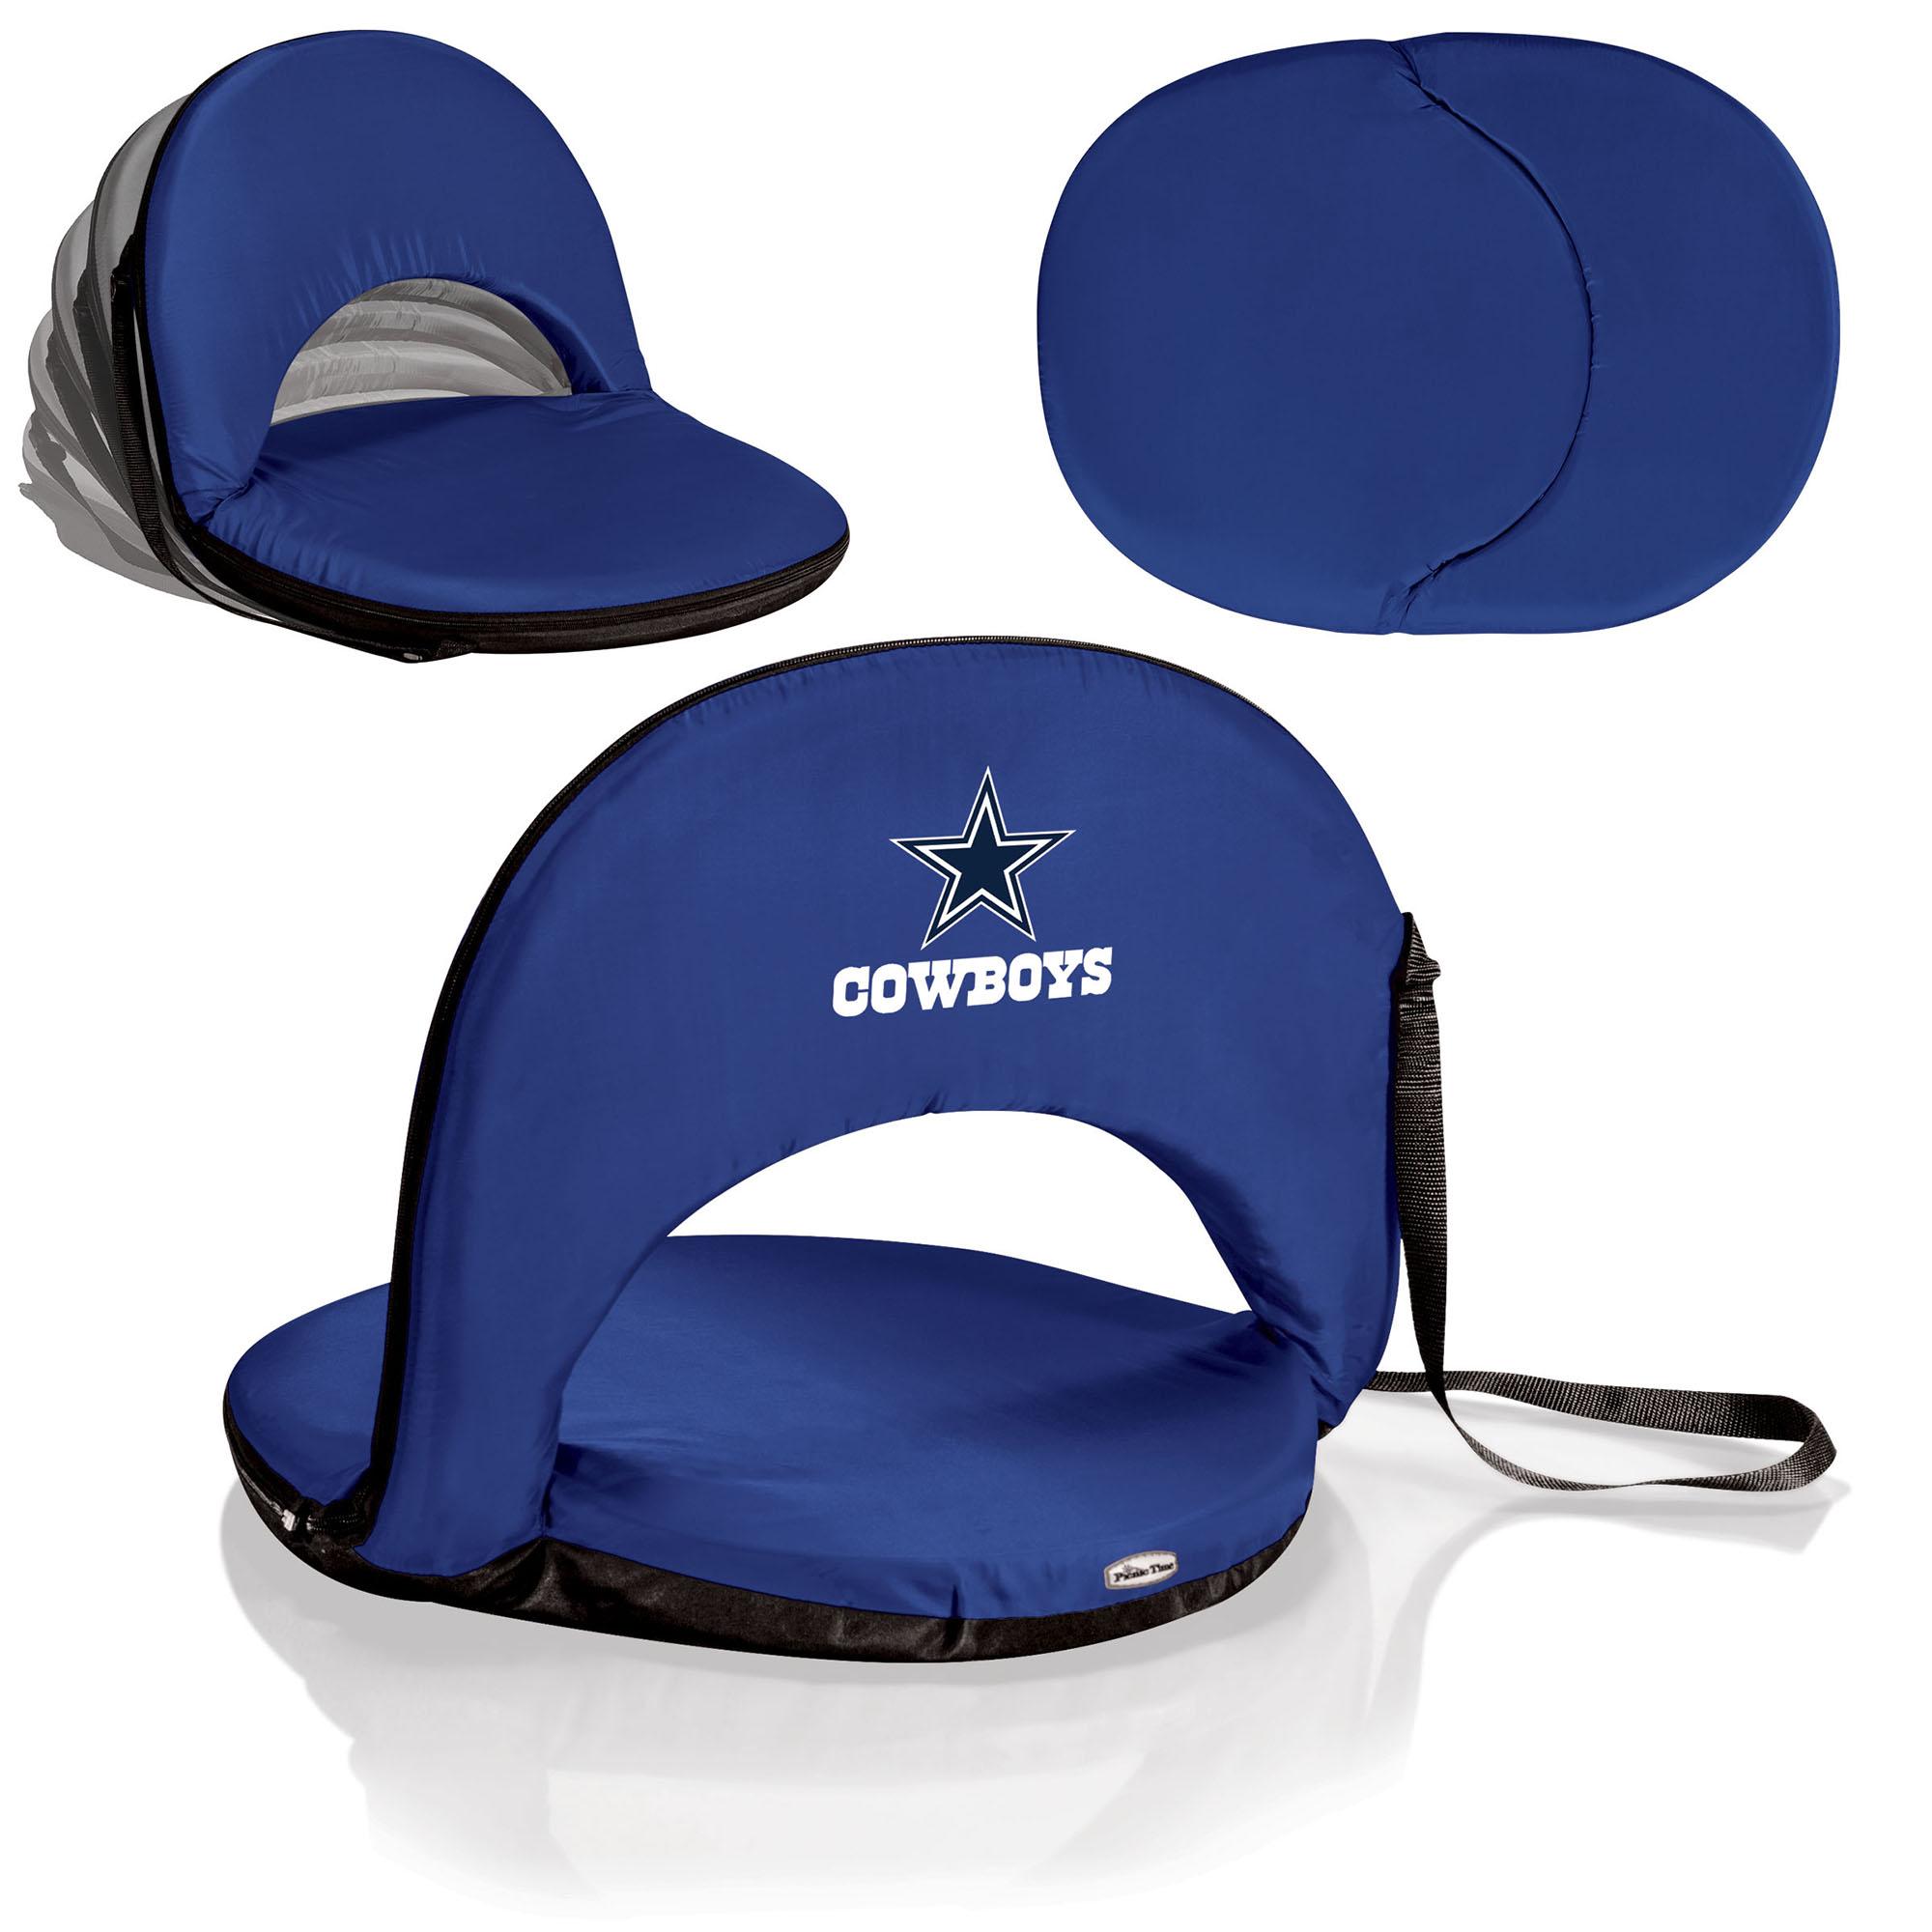 Dallas Cowboys Oniva Stadium Seat - Navy - No Size